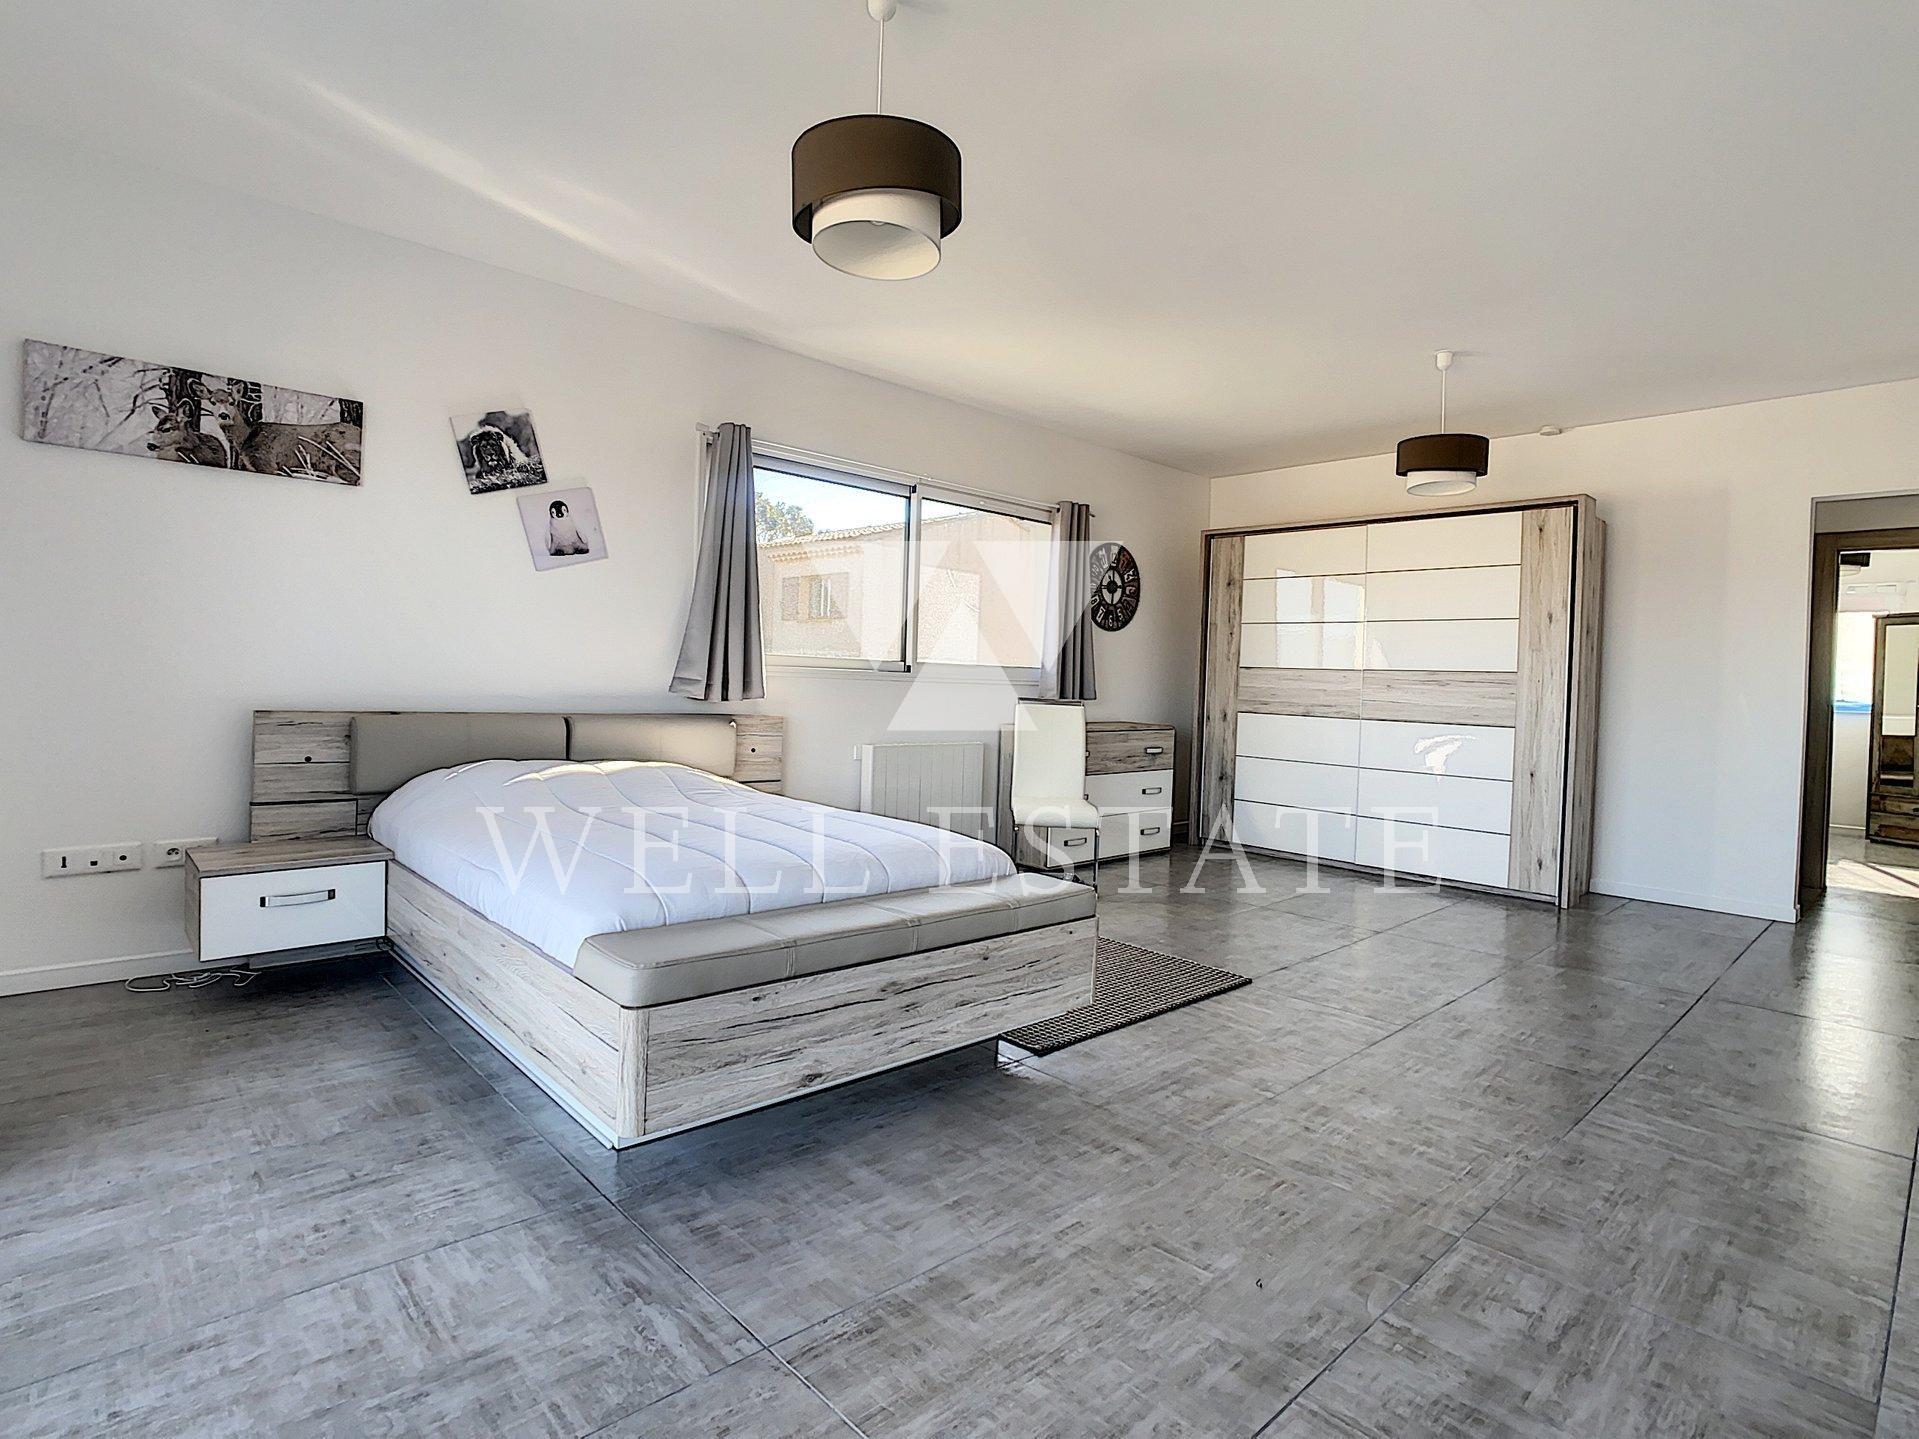 ST RAPHAEL CONTEMPORARY 4 BEDROOM VILLA 200M2 SWIMMING POOL